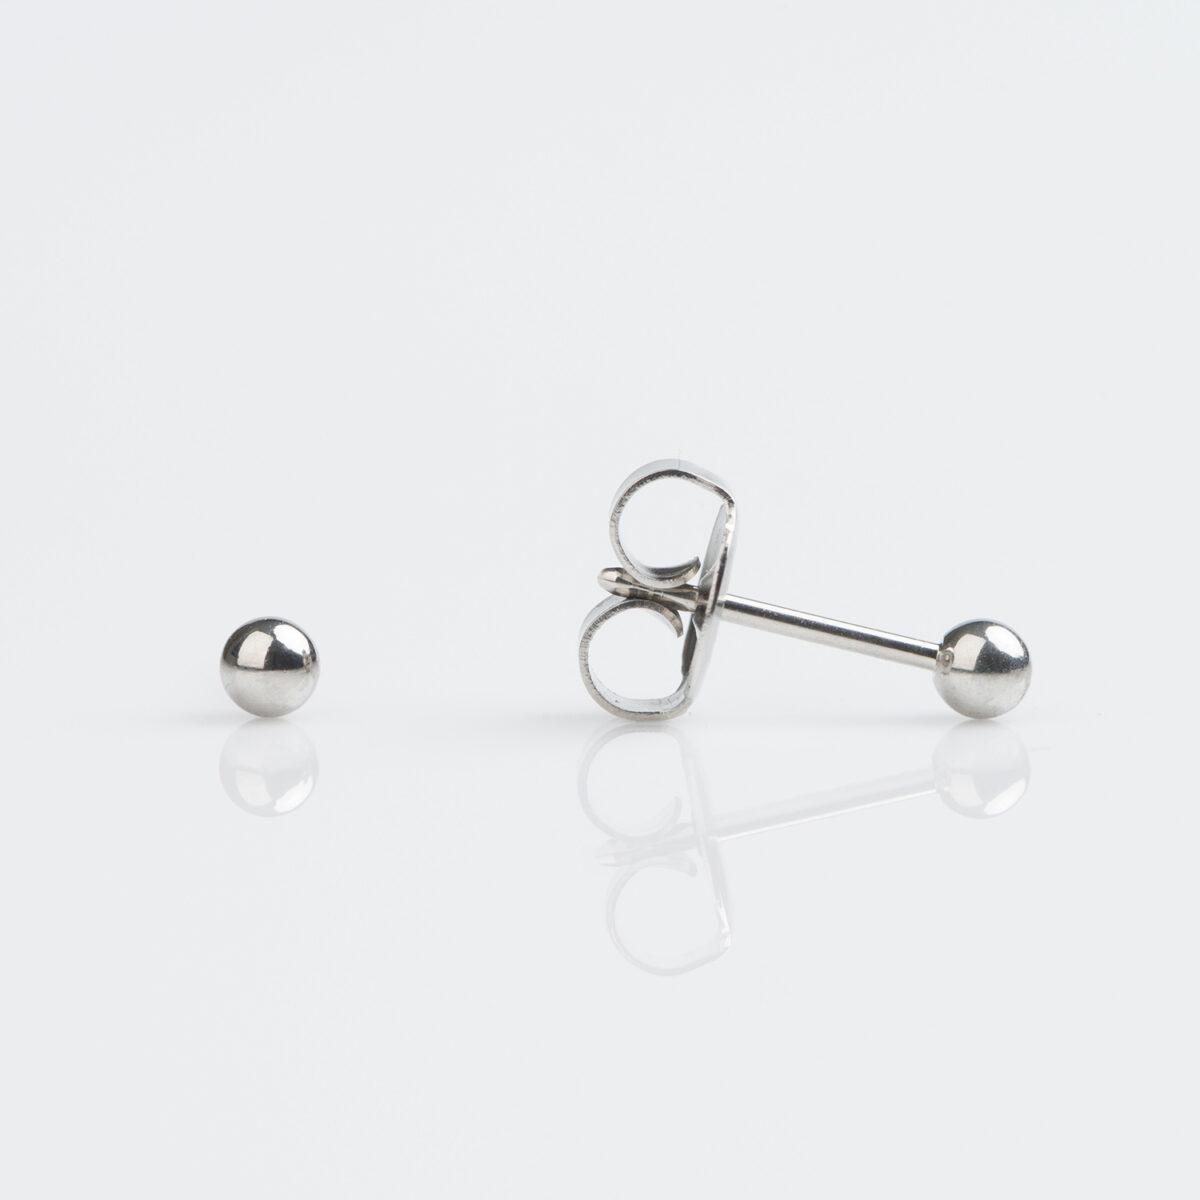 tiny-tips-steel-ball-3mm